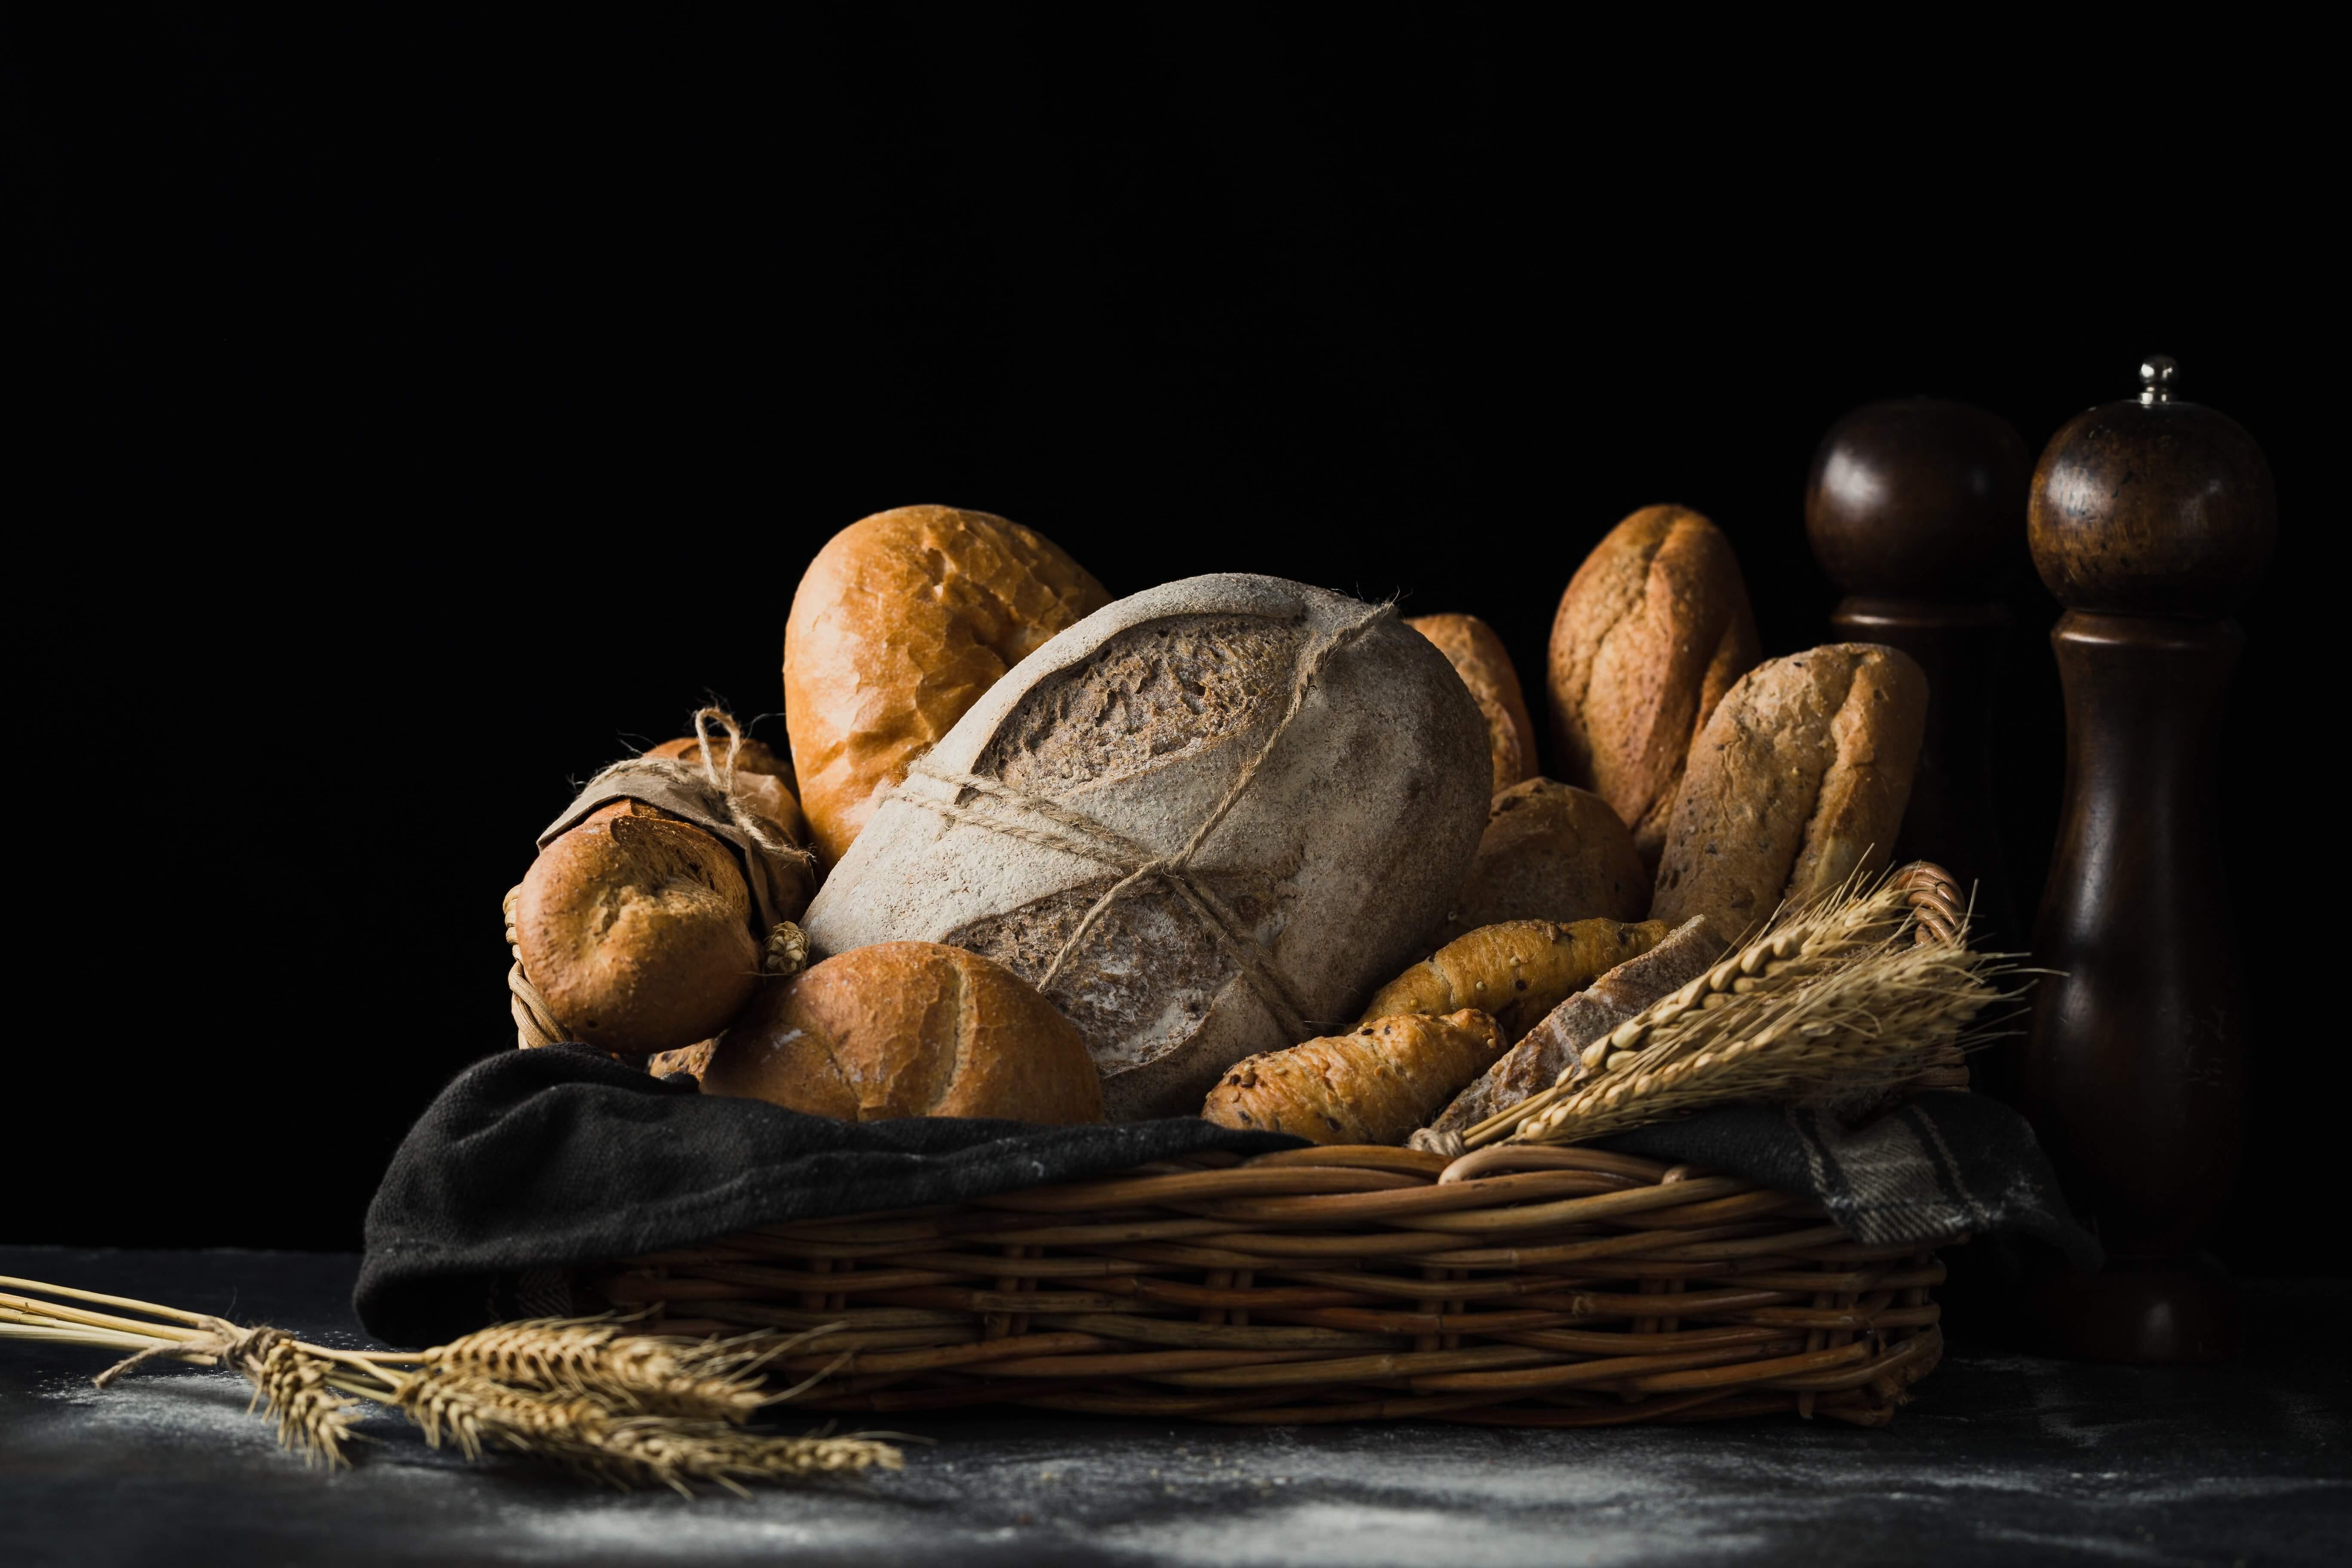 Defrosting bread